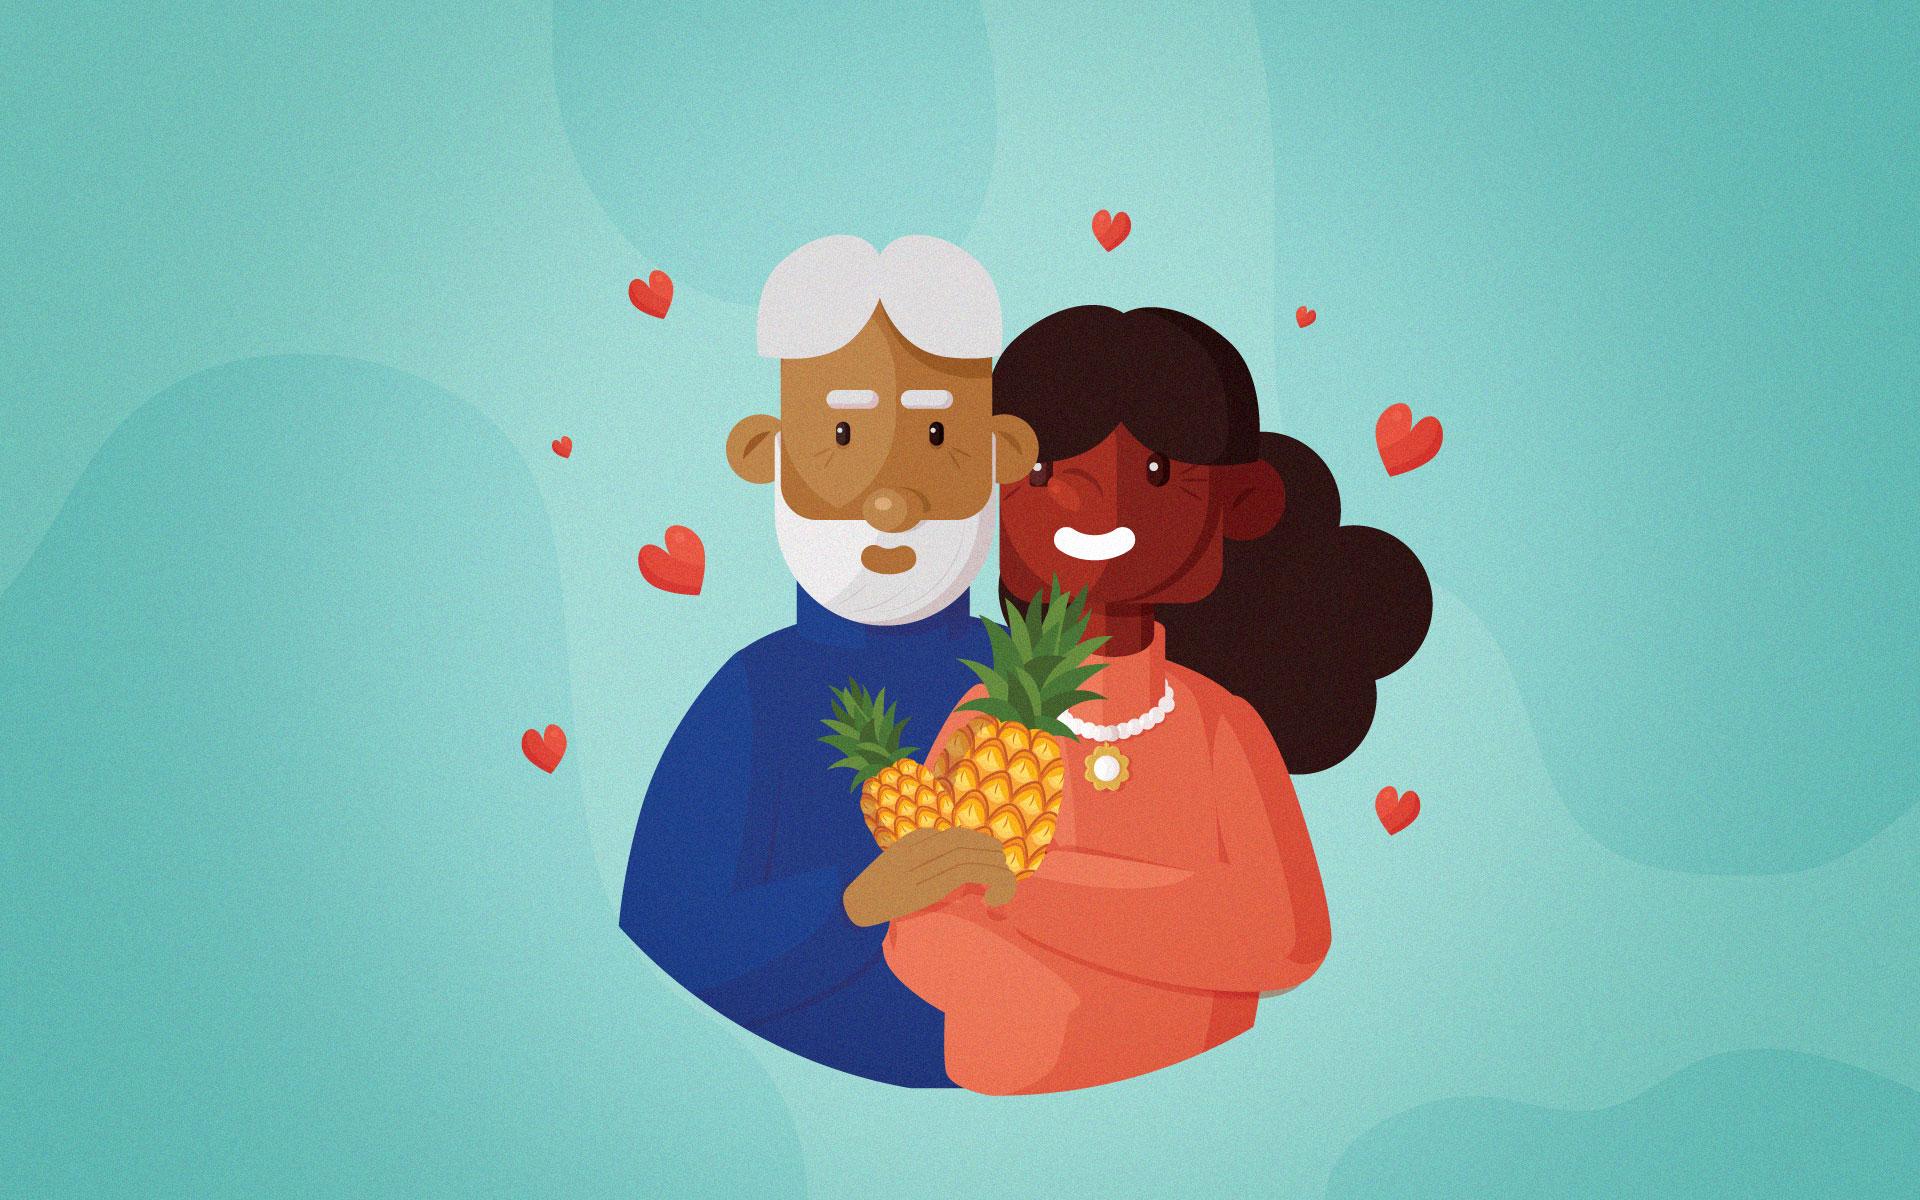 Pineapples, Port Alfred, and My Sweet Memories of uTata